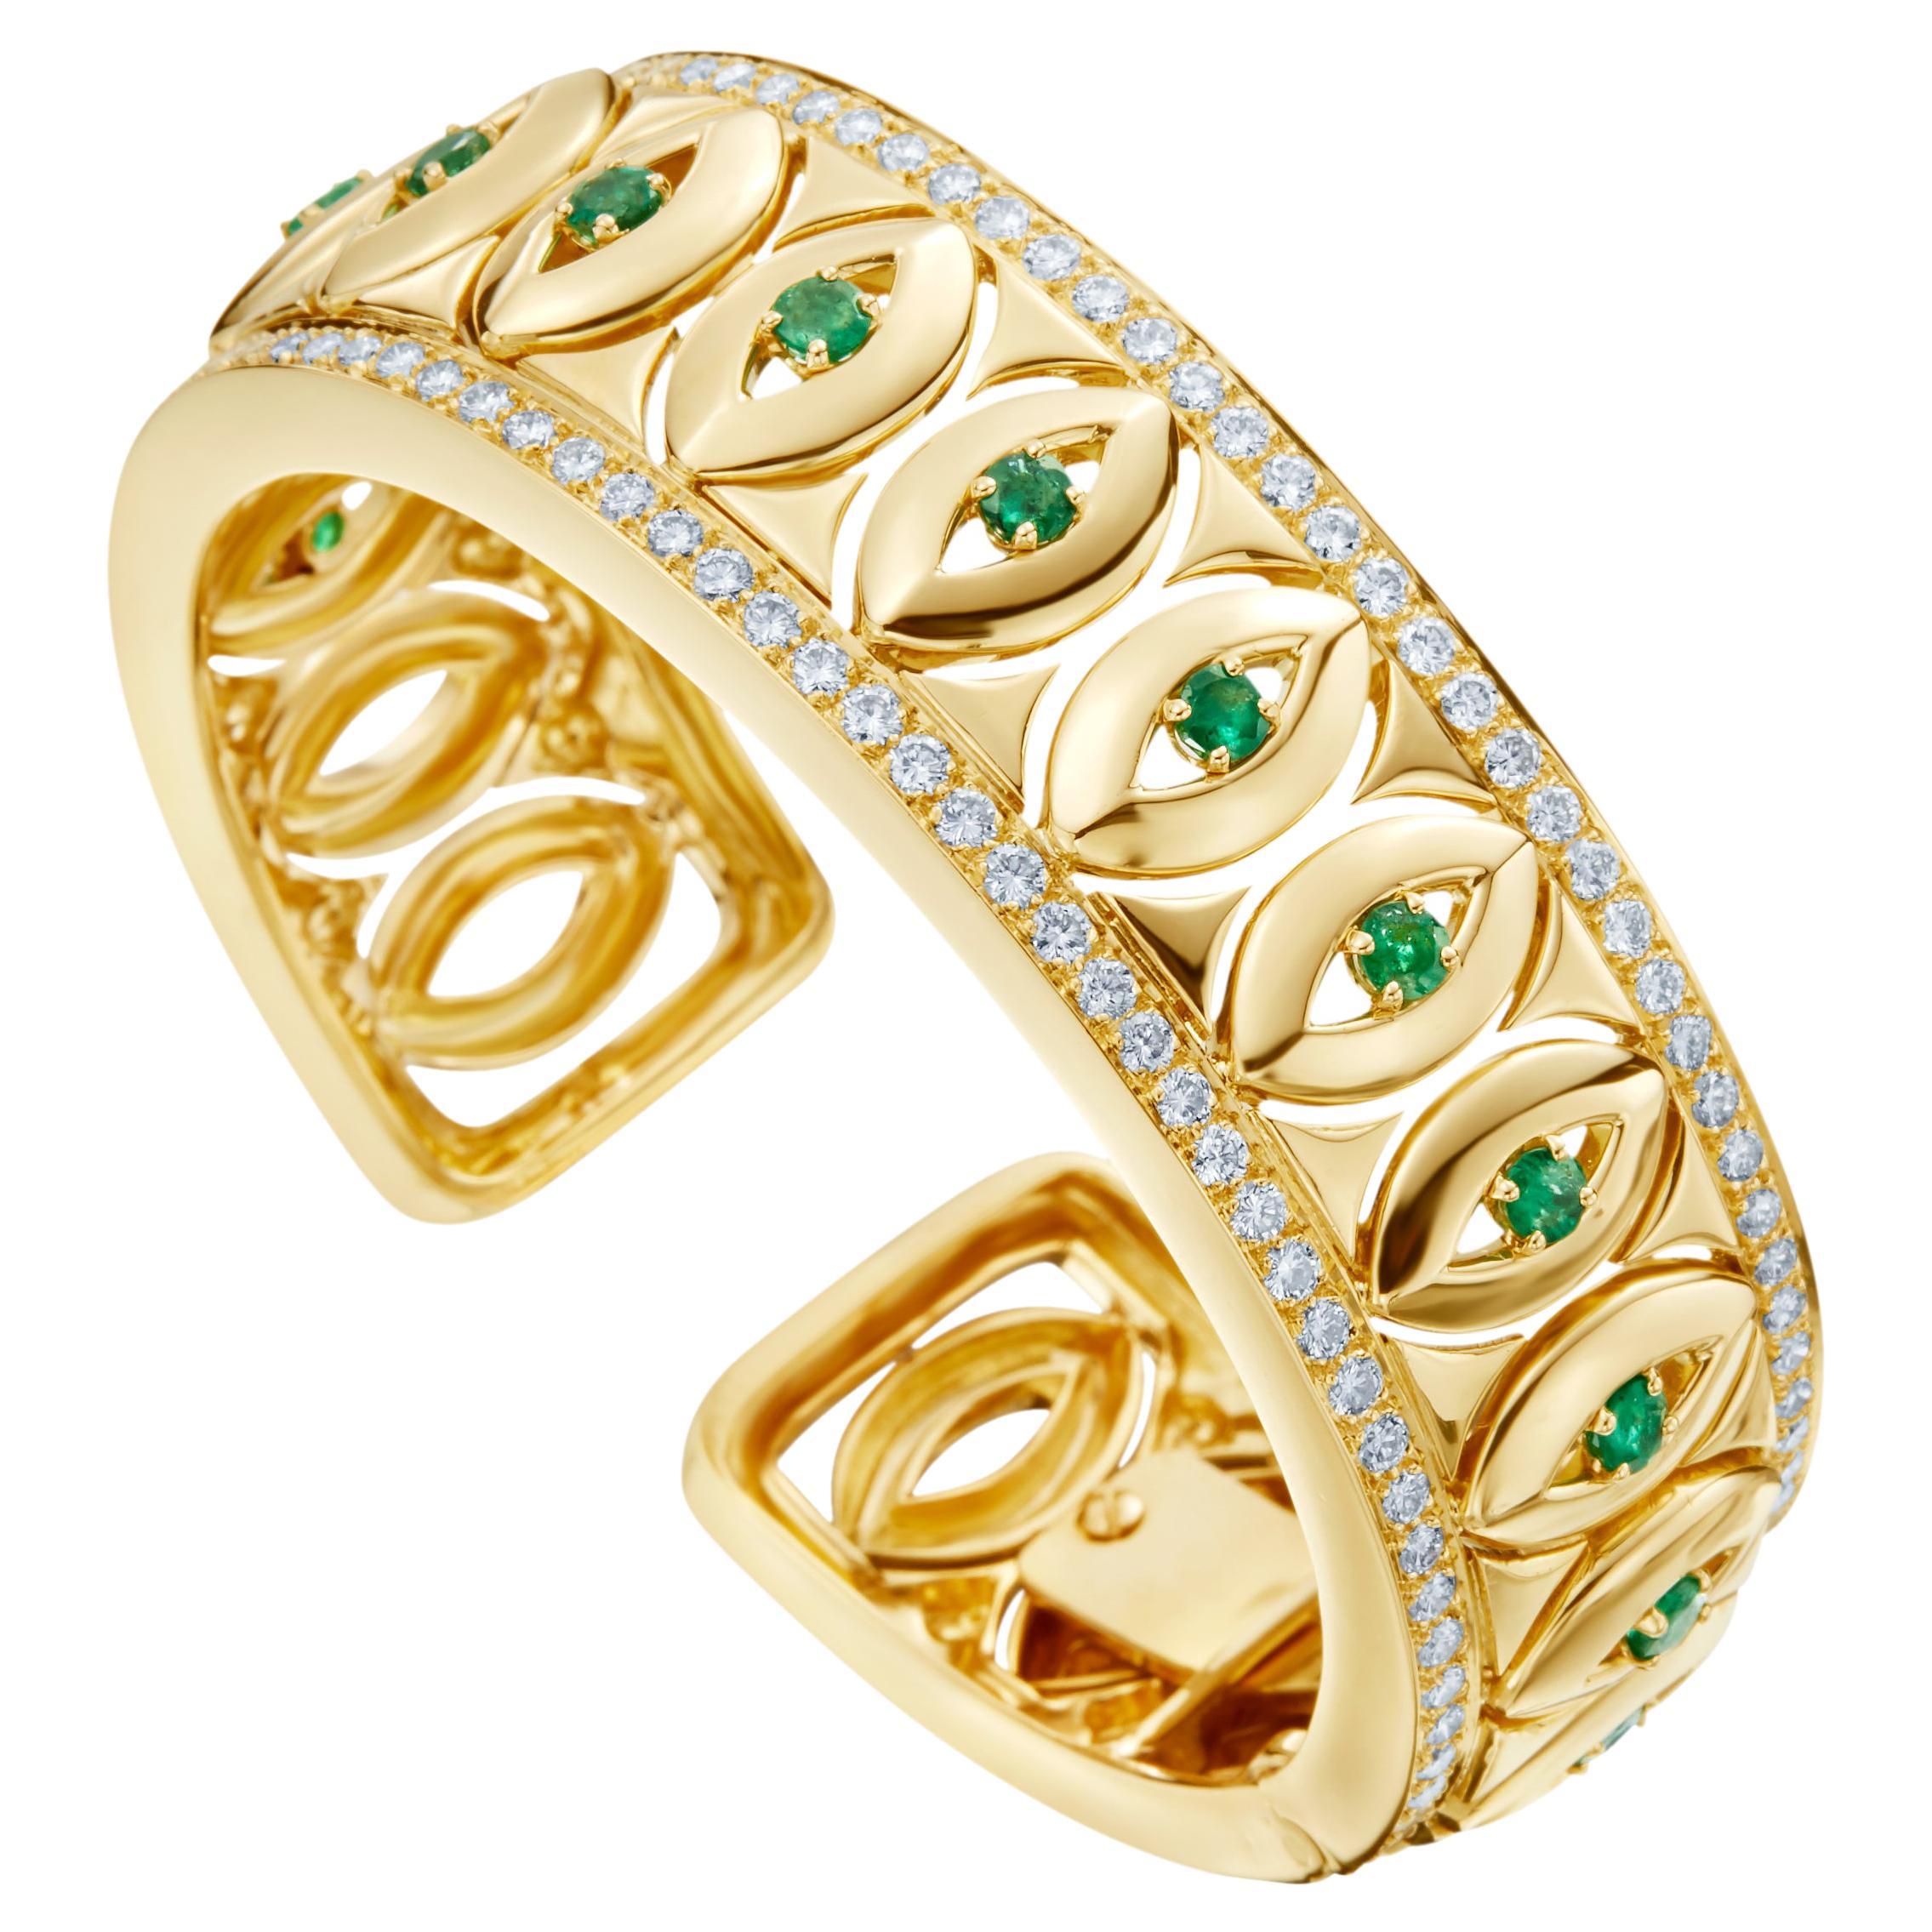 David Webb 18k Yellow Gold Emerald and Diamond Bangle